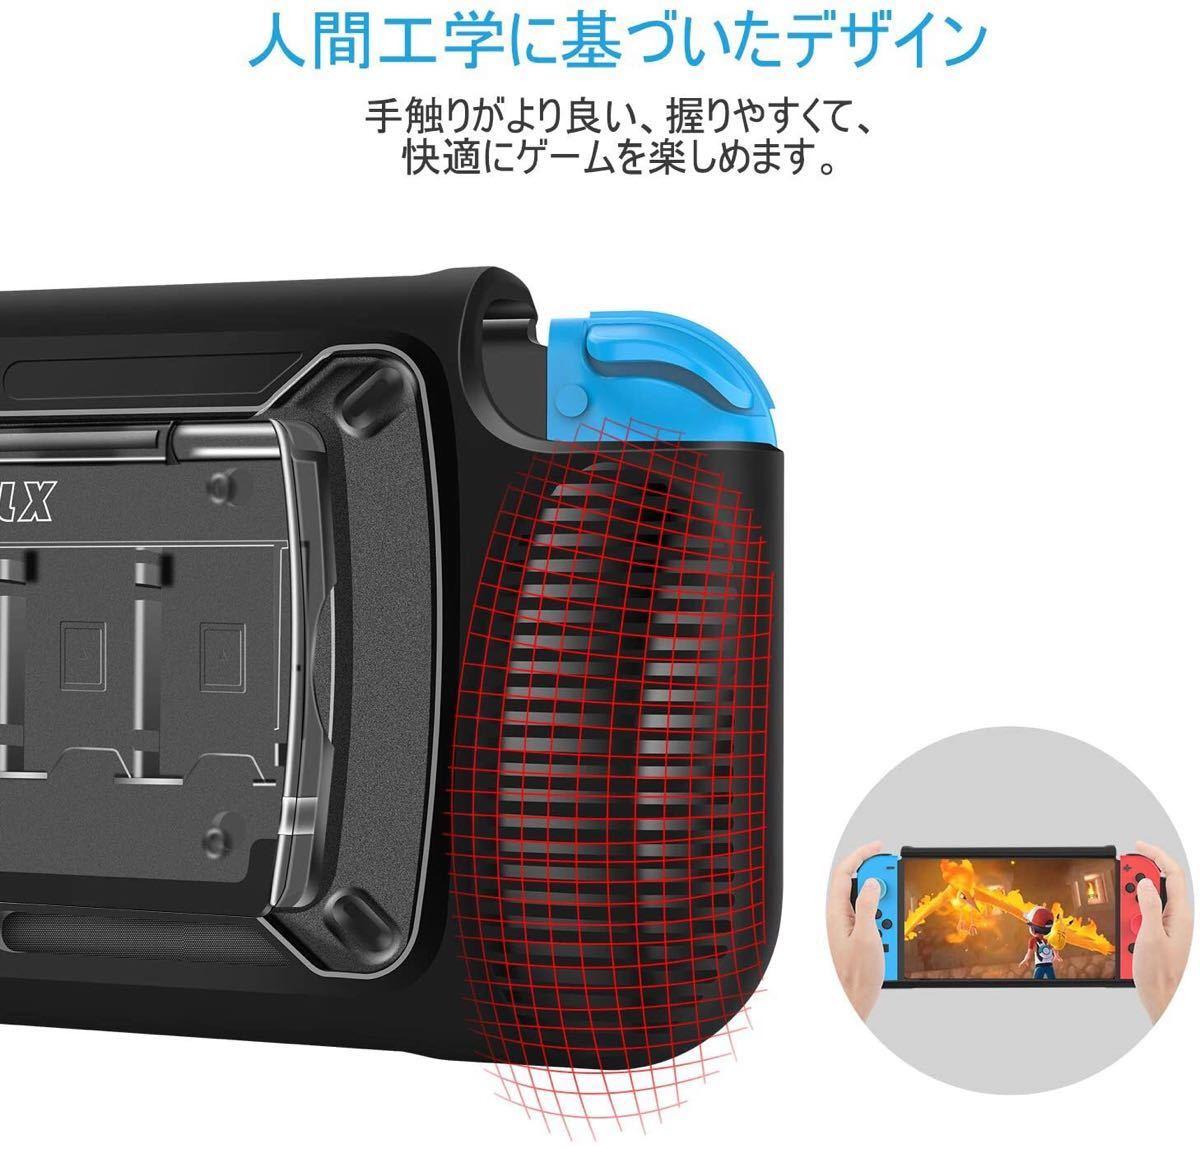 Nintendo Switch カバー 任天堂スイッチ 7つゲームカード収納可能 ケース スタンド機能 【改良版Bluetoothトランスミッター対応設計 耐衝撃